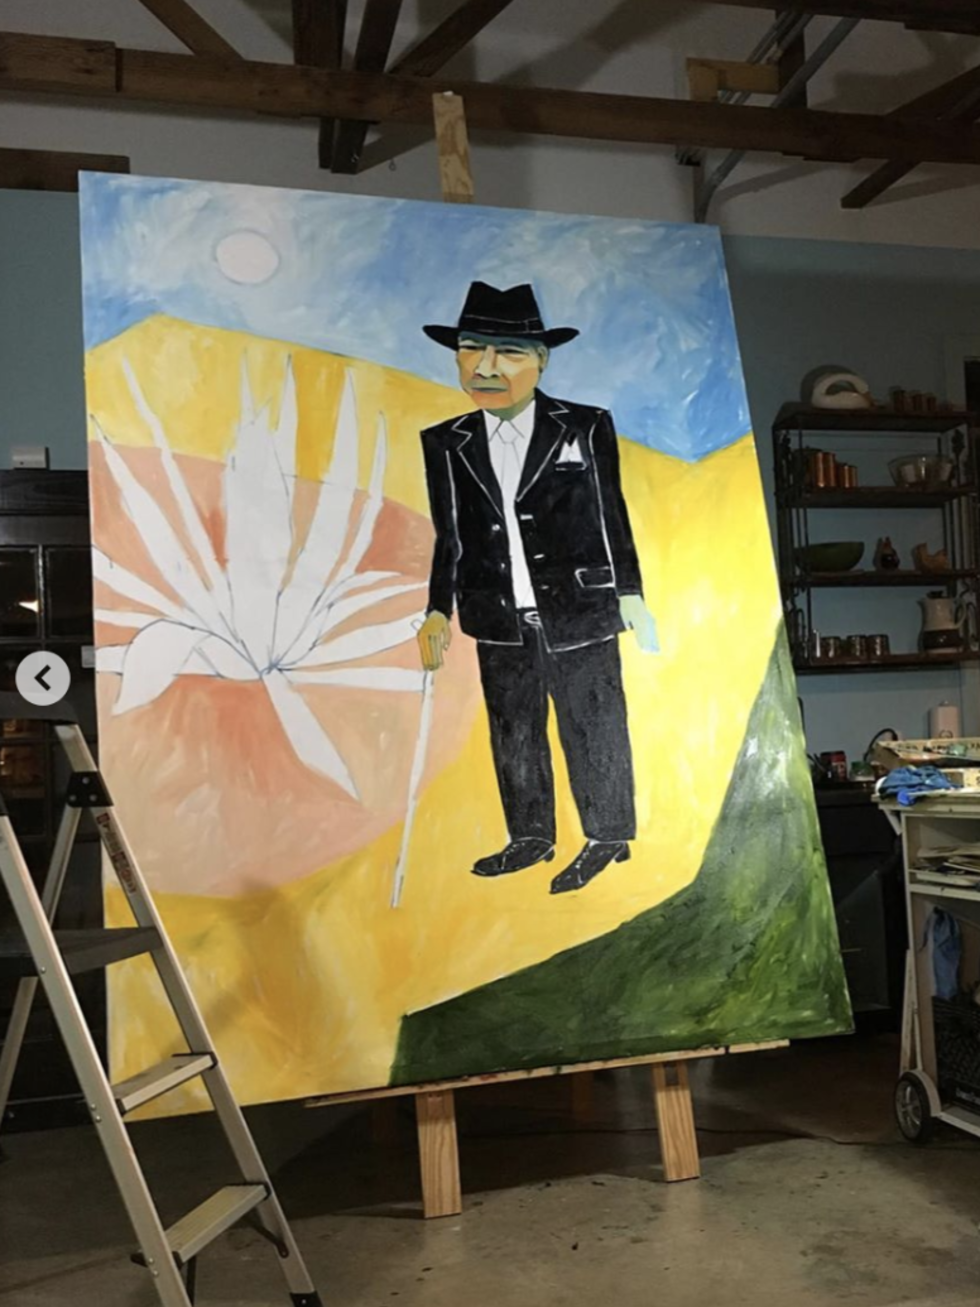 Tomás Ybarra-Frausto in an Aztlán dream by Cruz Ortiz